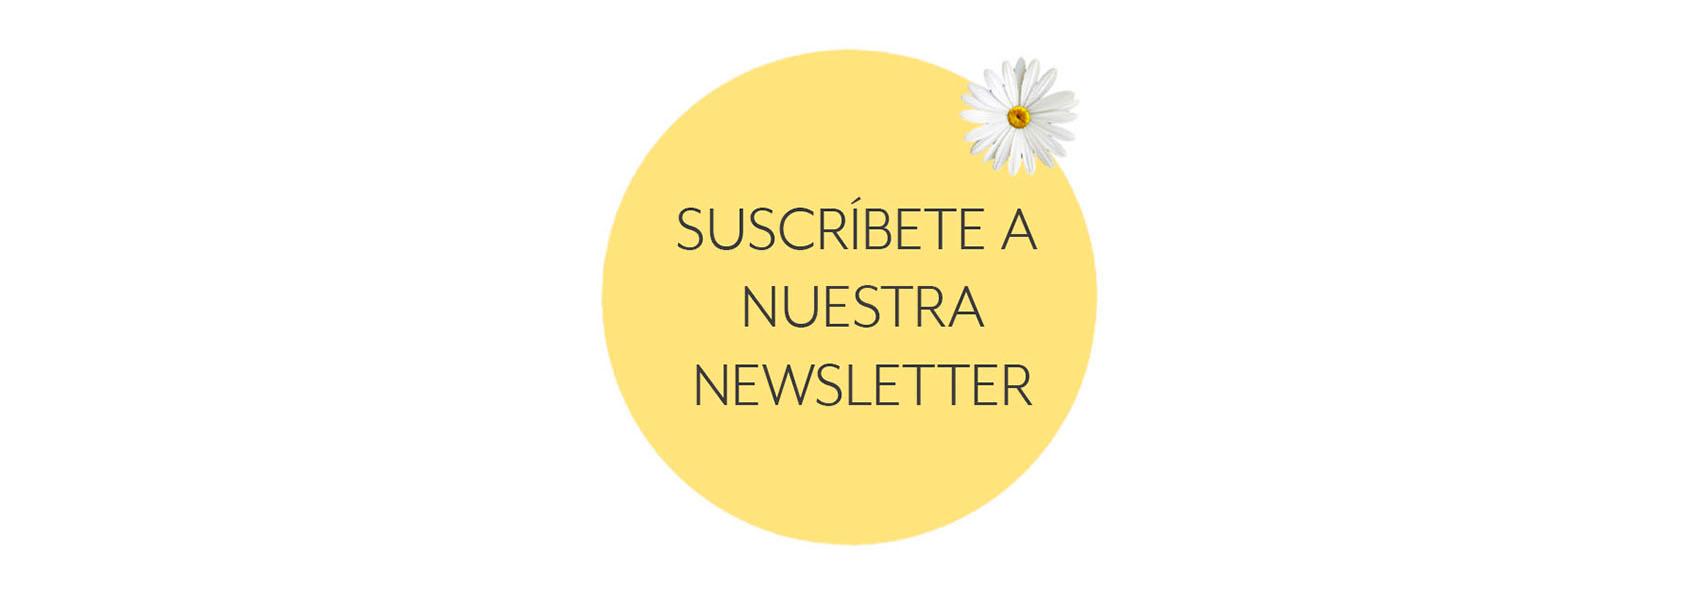 ¡Suscríbete a nuestra newsletter!